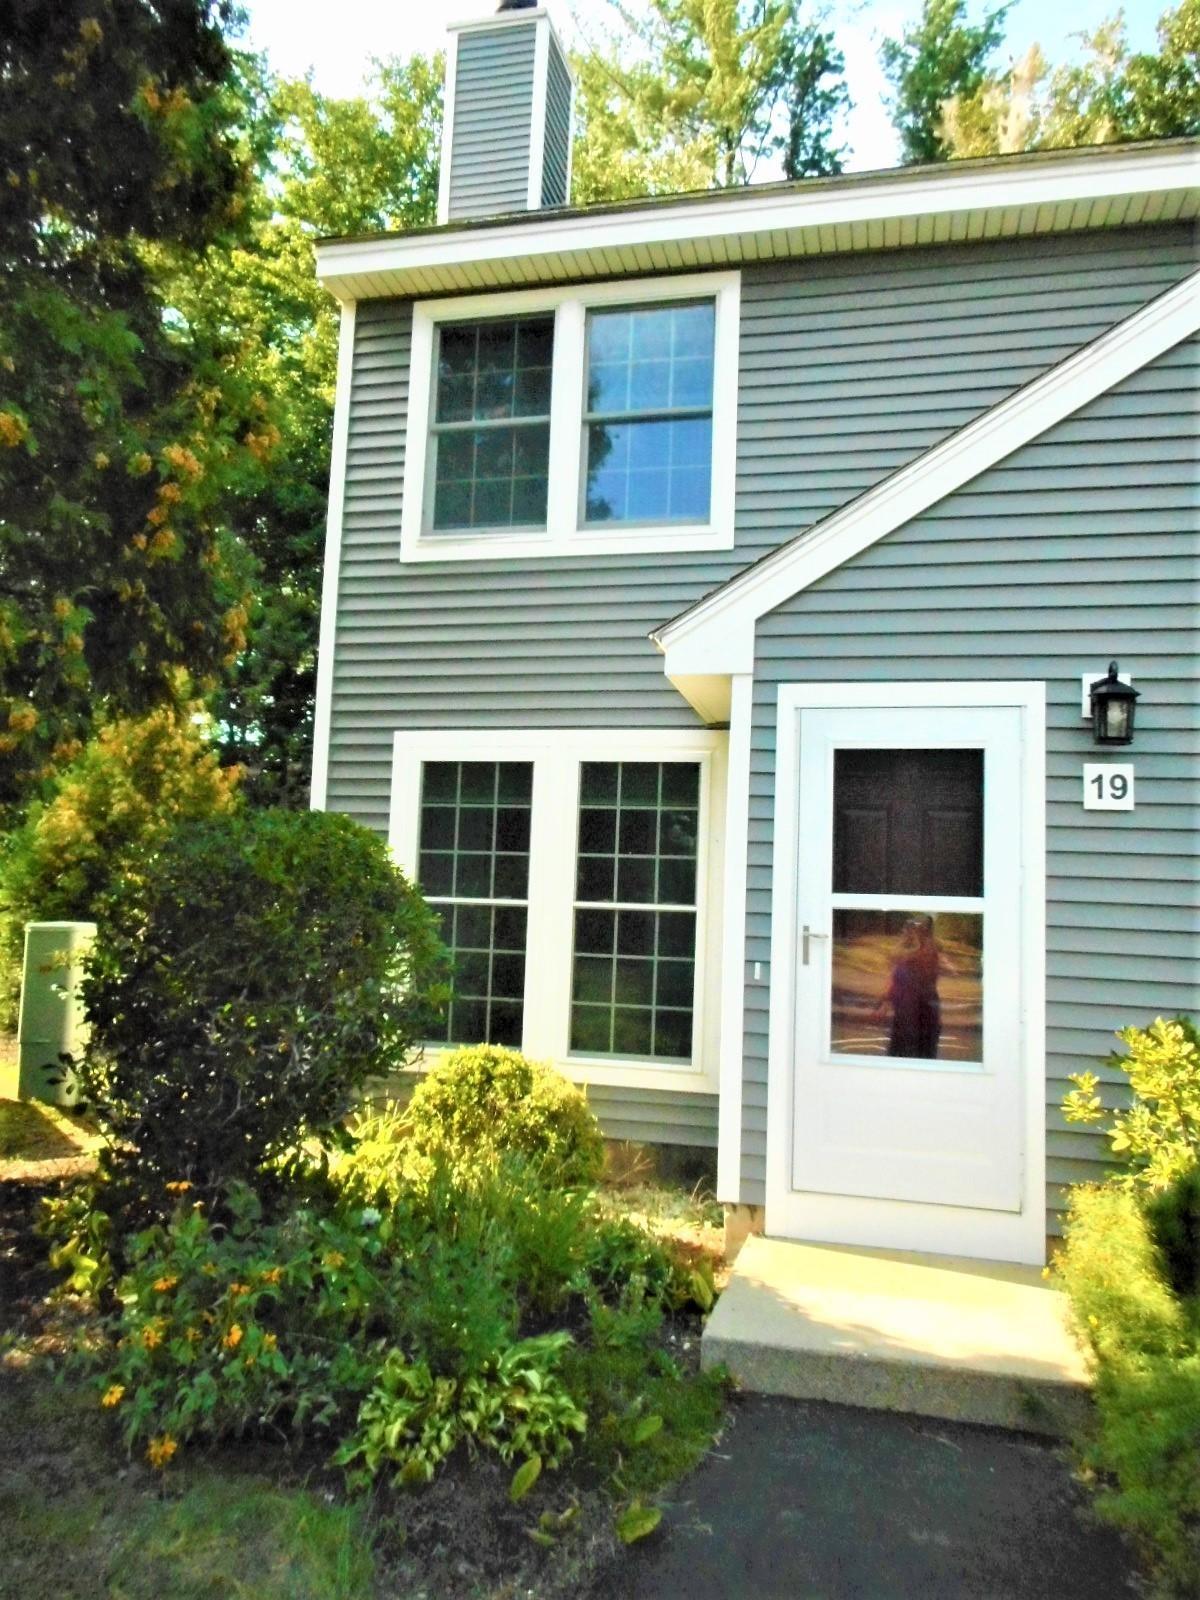 19 NE Village Road, Concord, NH 03301